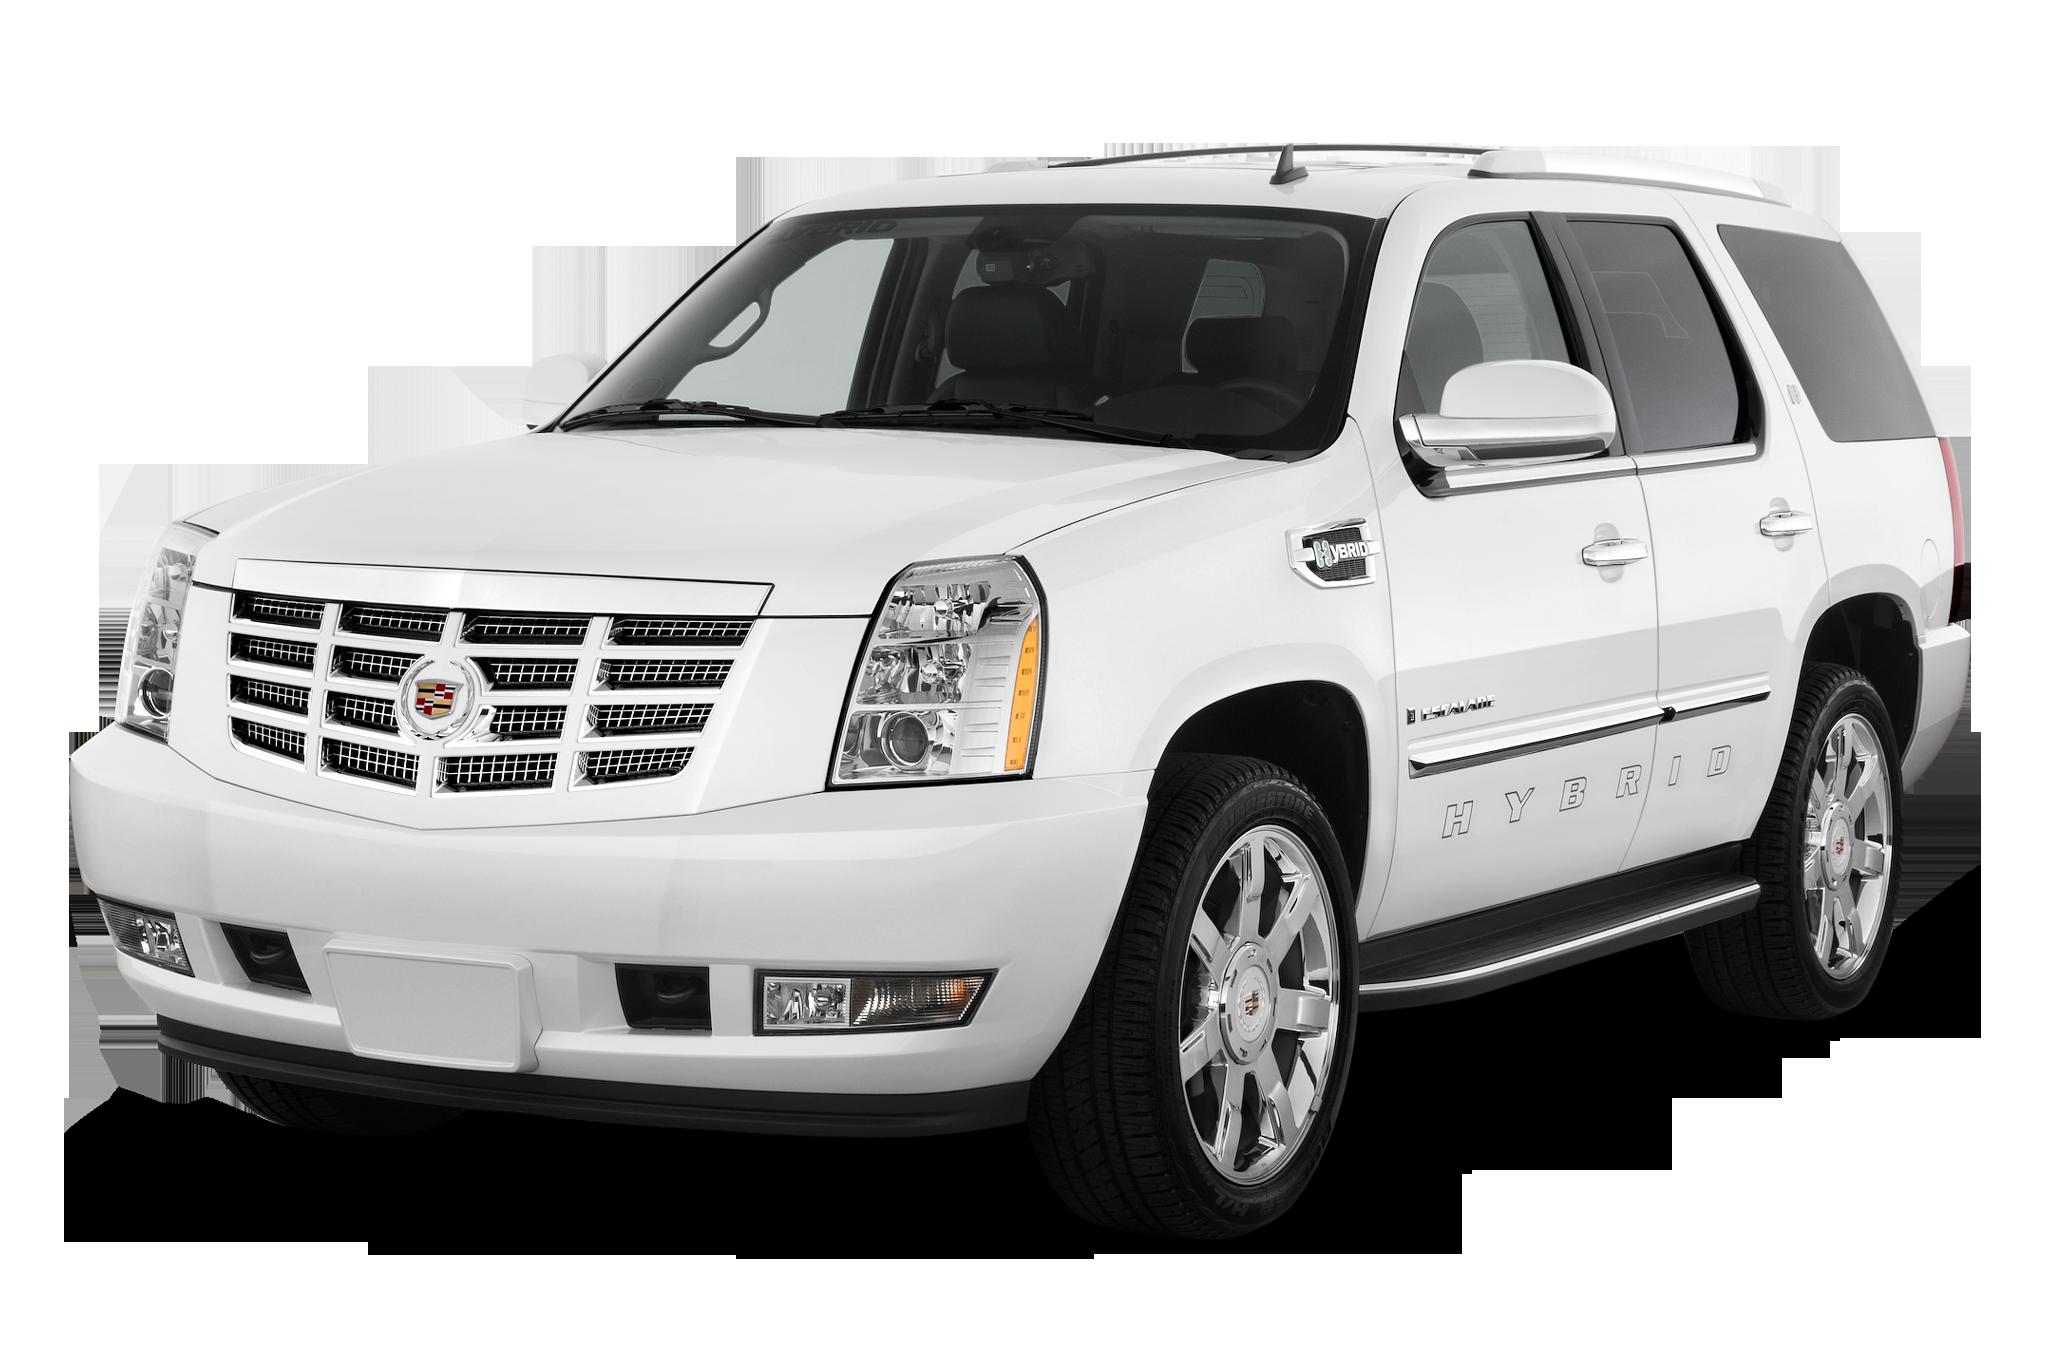 Latest Cadillac Escalade >> Study: Auto Thieves Still Prefer Trucks, SUVs, and Cadillac Escalades